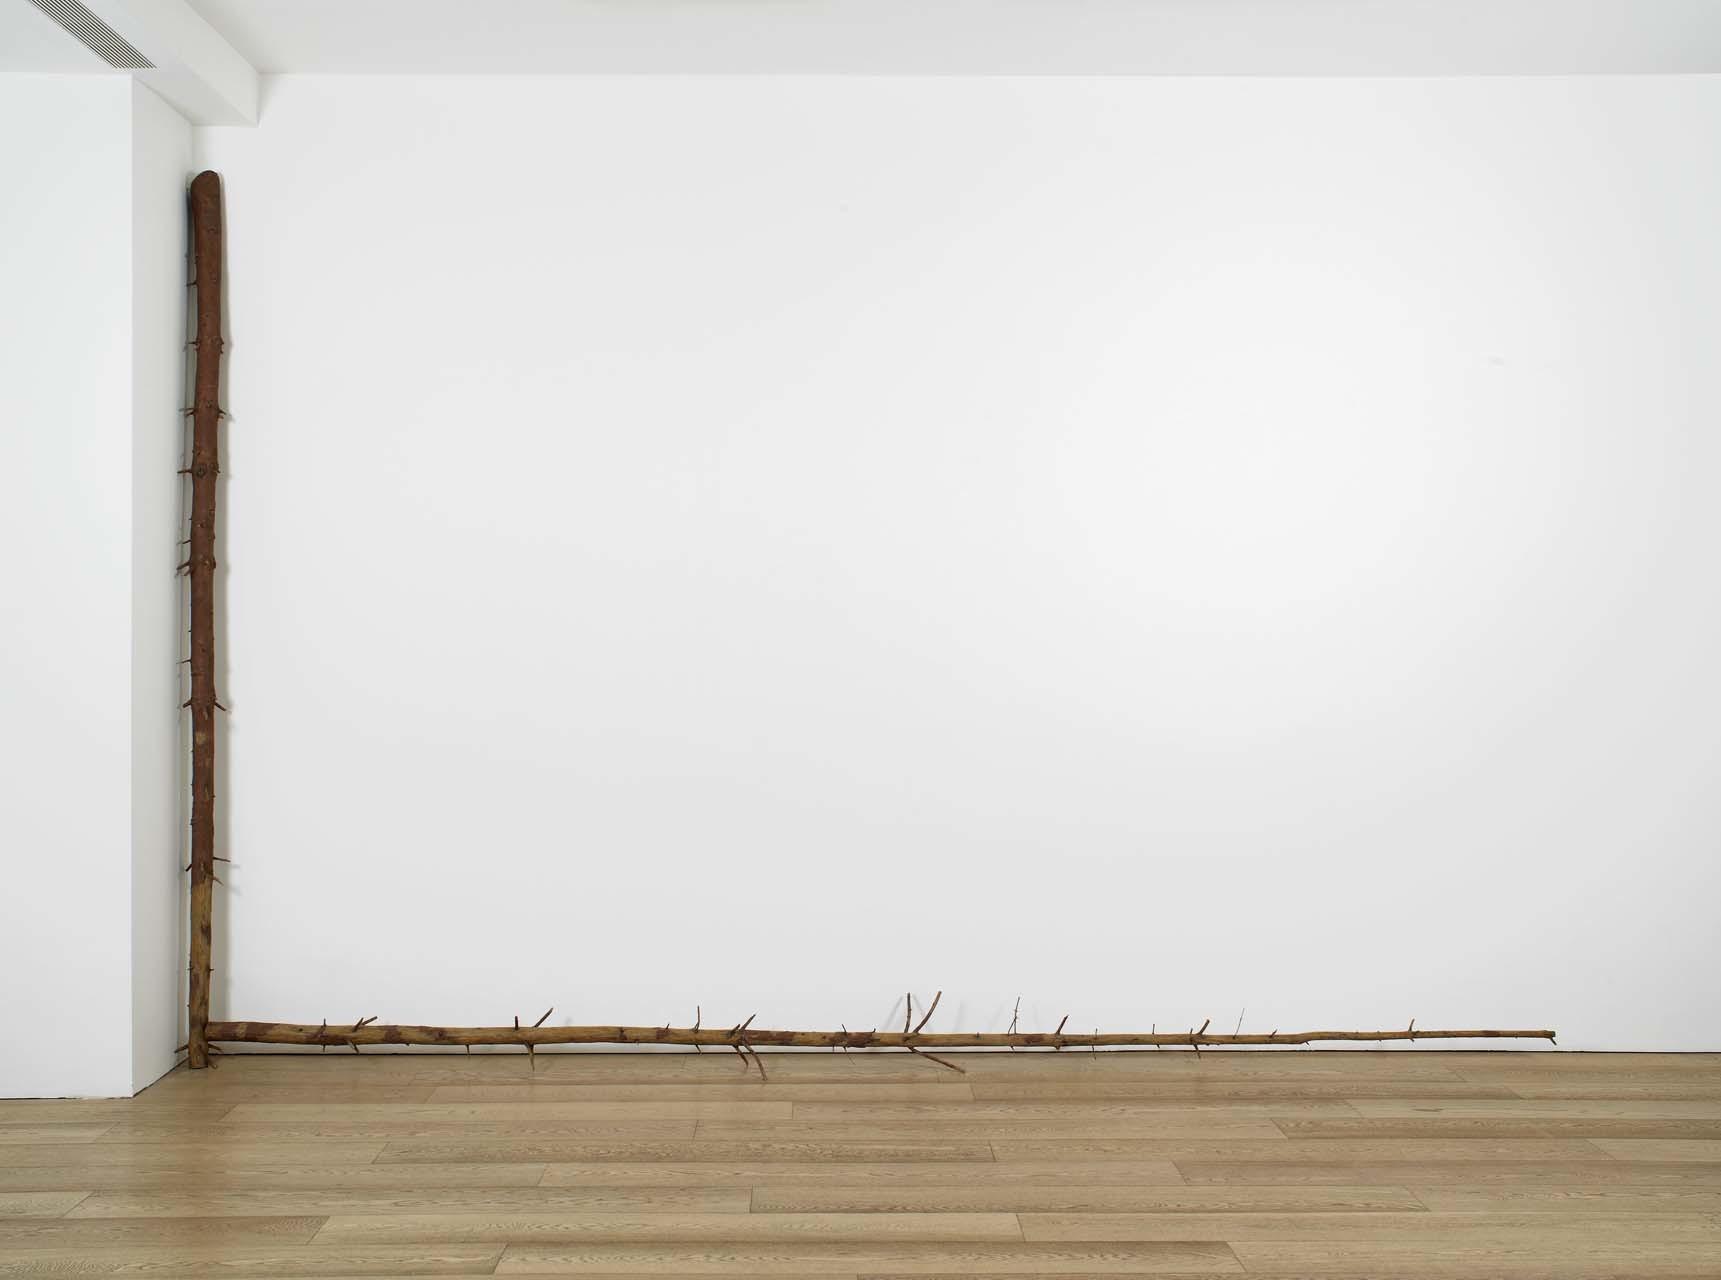 "<div class=""artwork_caption""><p>still.life. (pine tree standing in a corner), 2008</p></div>"